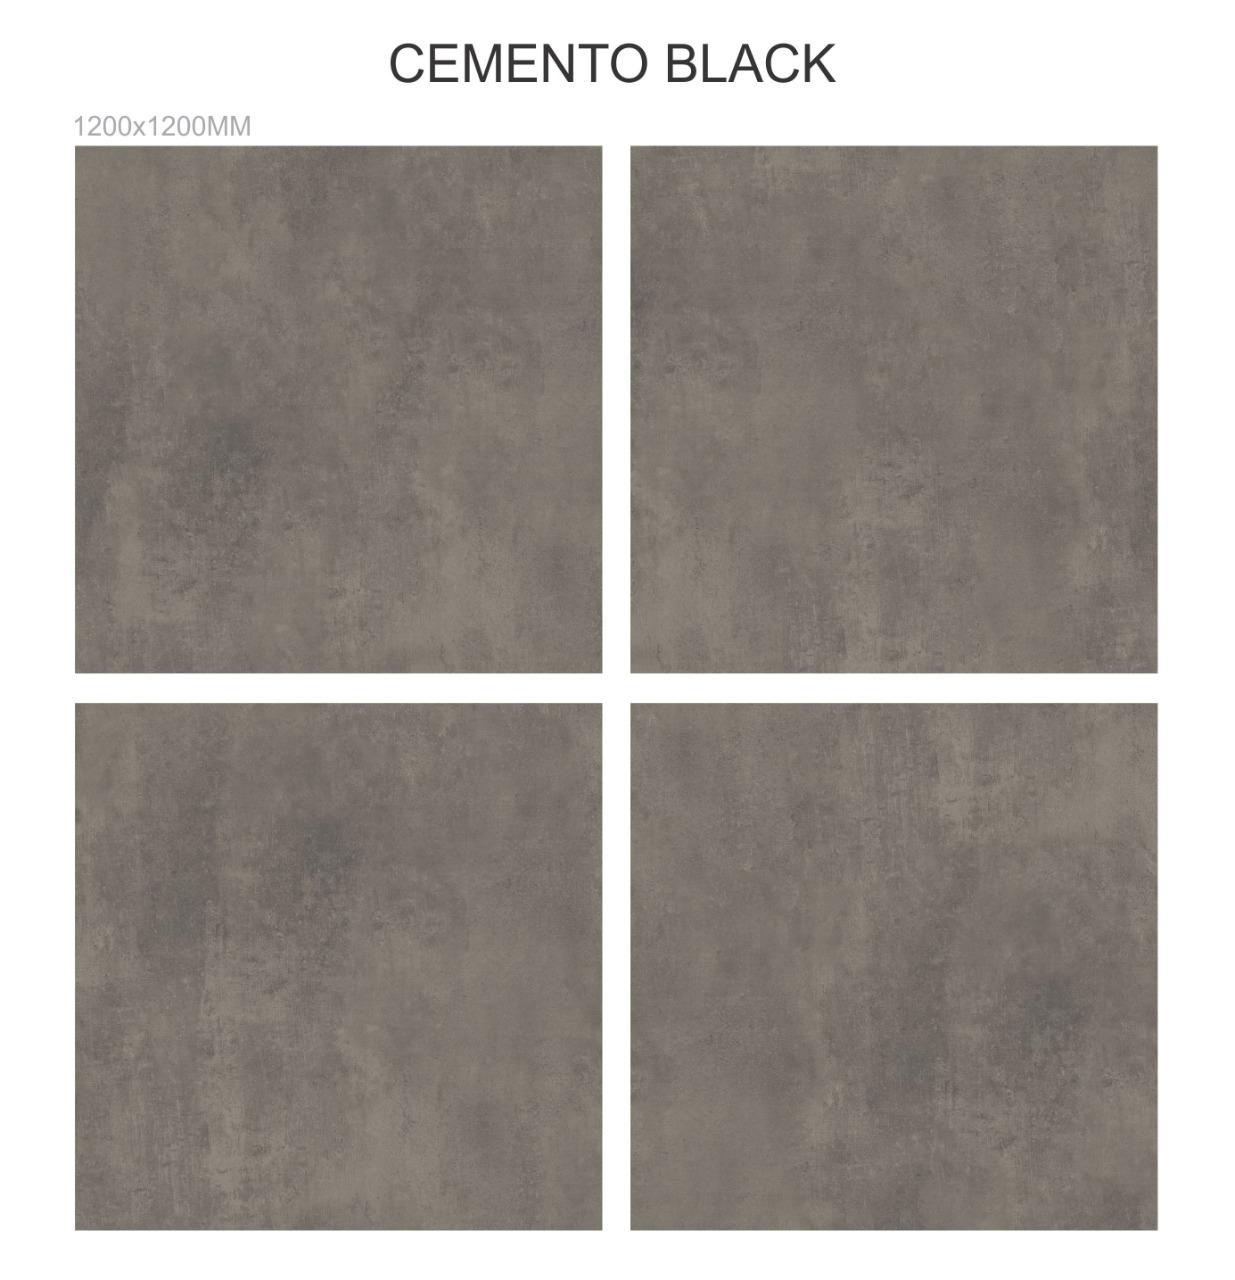 Cemento Black 1200x1200mm